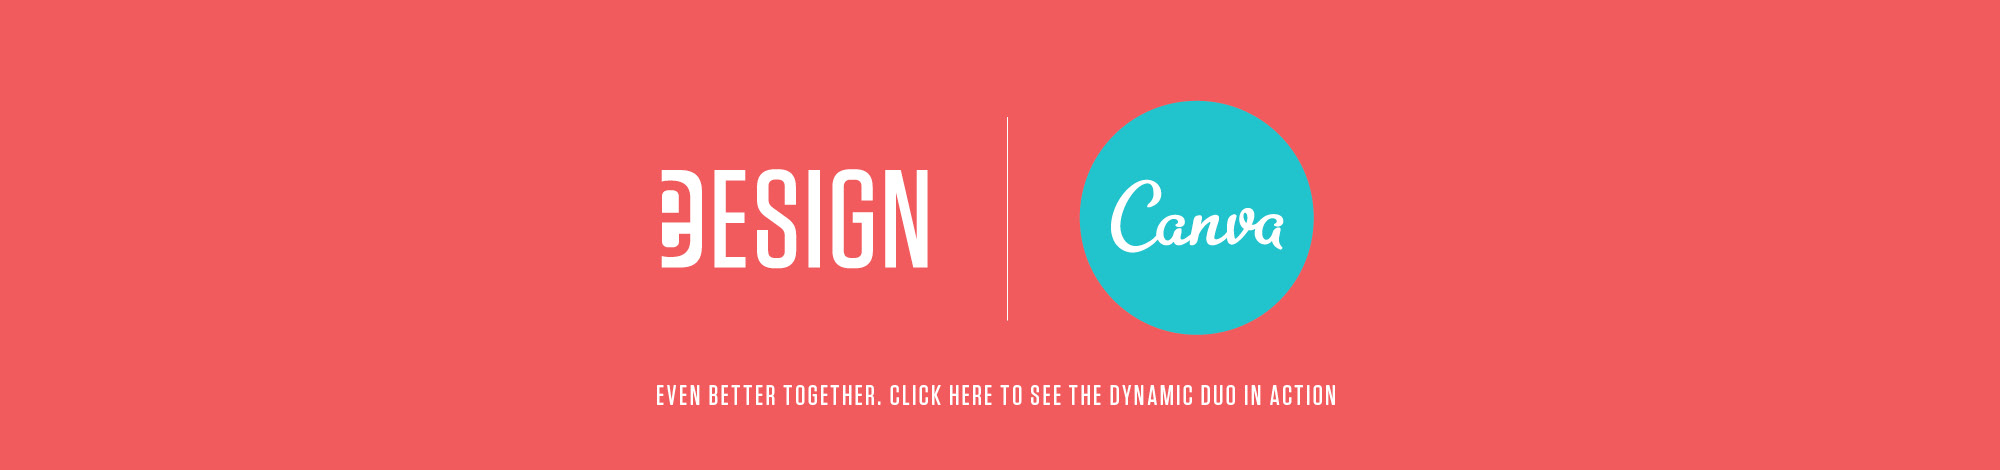 Partnership between Herff Jones and Canva opens a new era of yearbook creativity